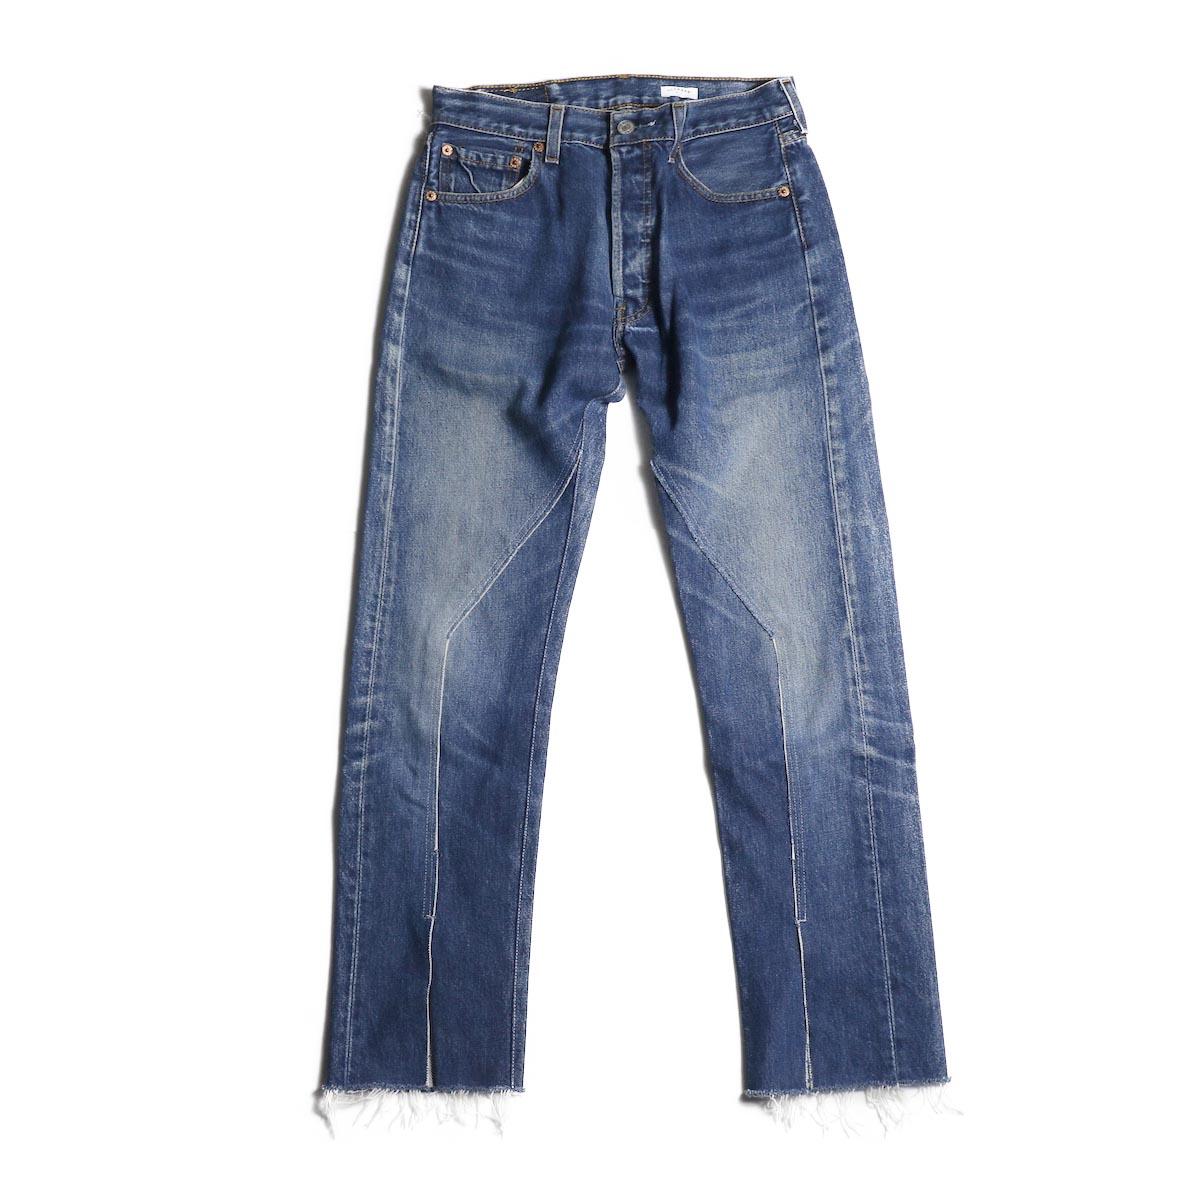 OLD PARK / Slit Jeans (Blue) (Ssize-A)